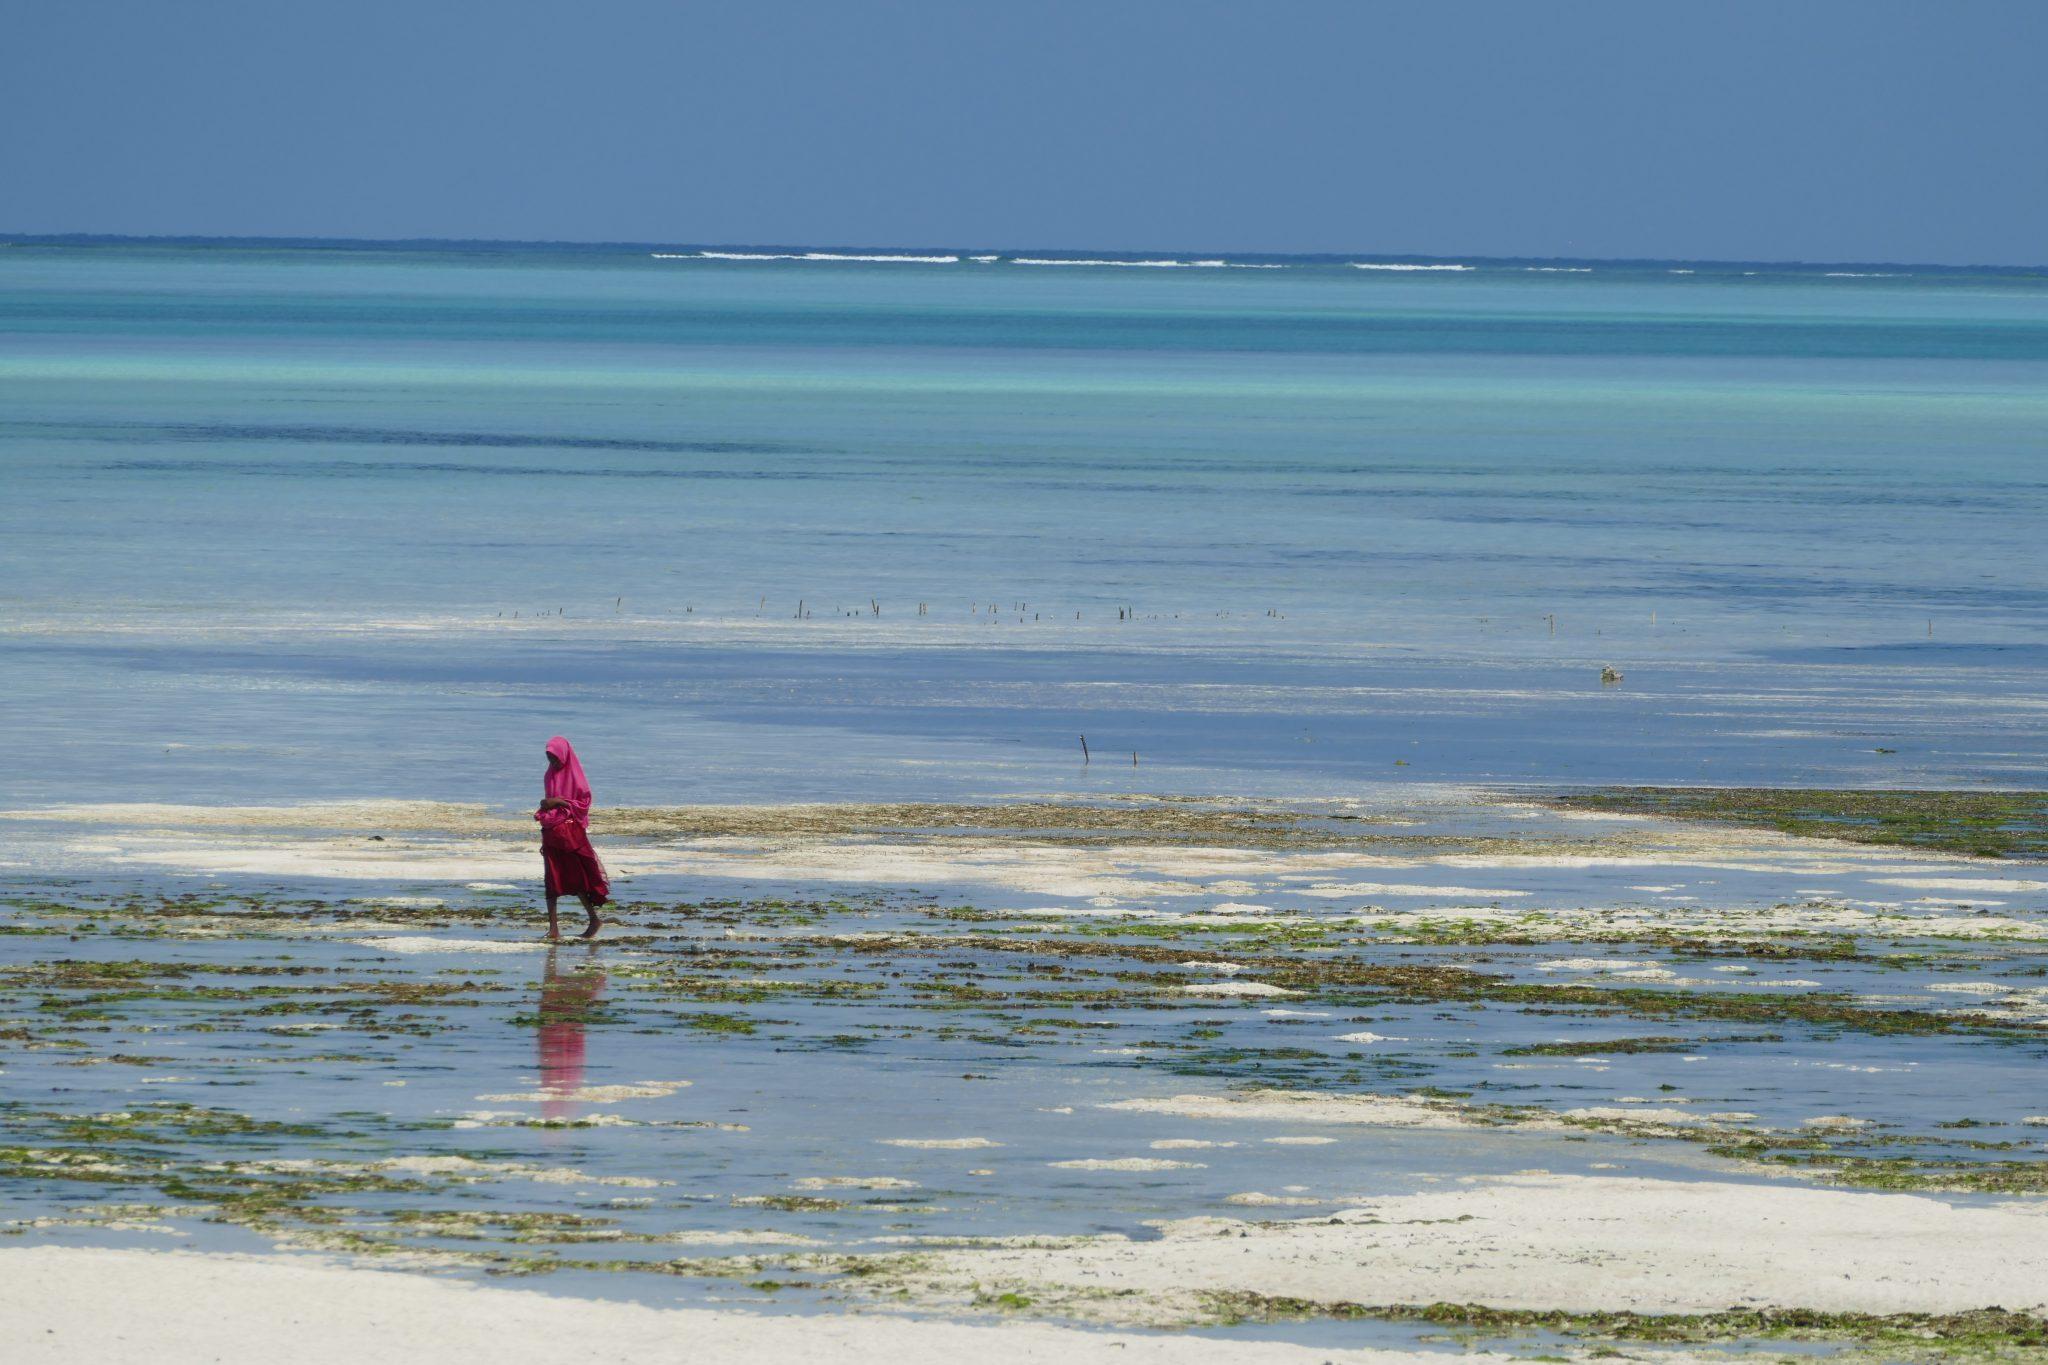 Reflets dans l'eau turquoise de Zanzibar